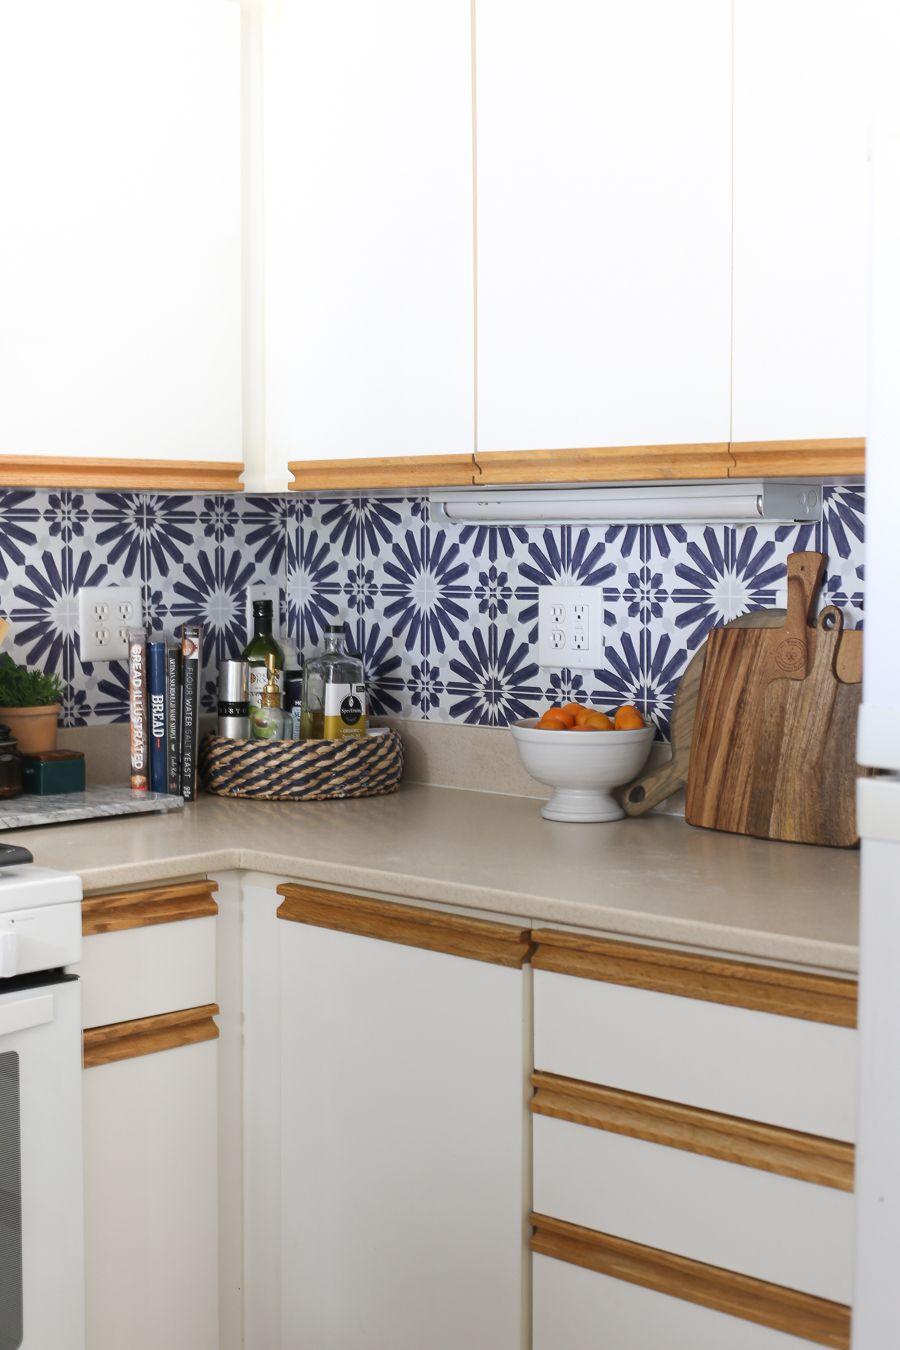 How To Add A Peel And Stick Kitchen Backsplash In A Rental Kitchen Inspirations Rental Kitchen Kitchen Backsplash